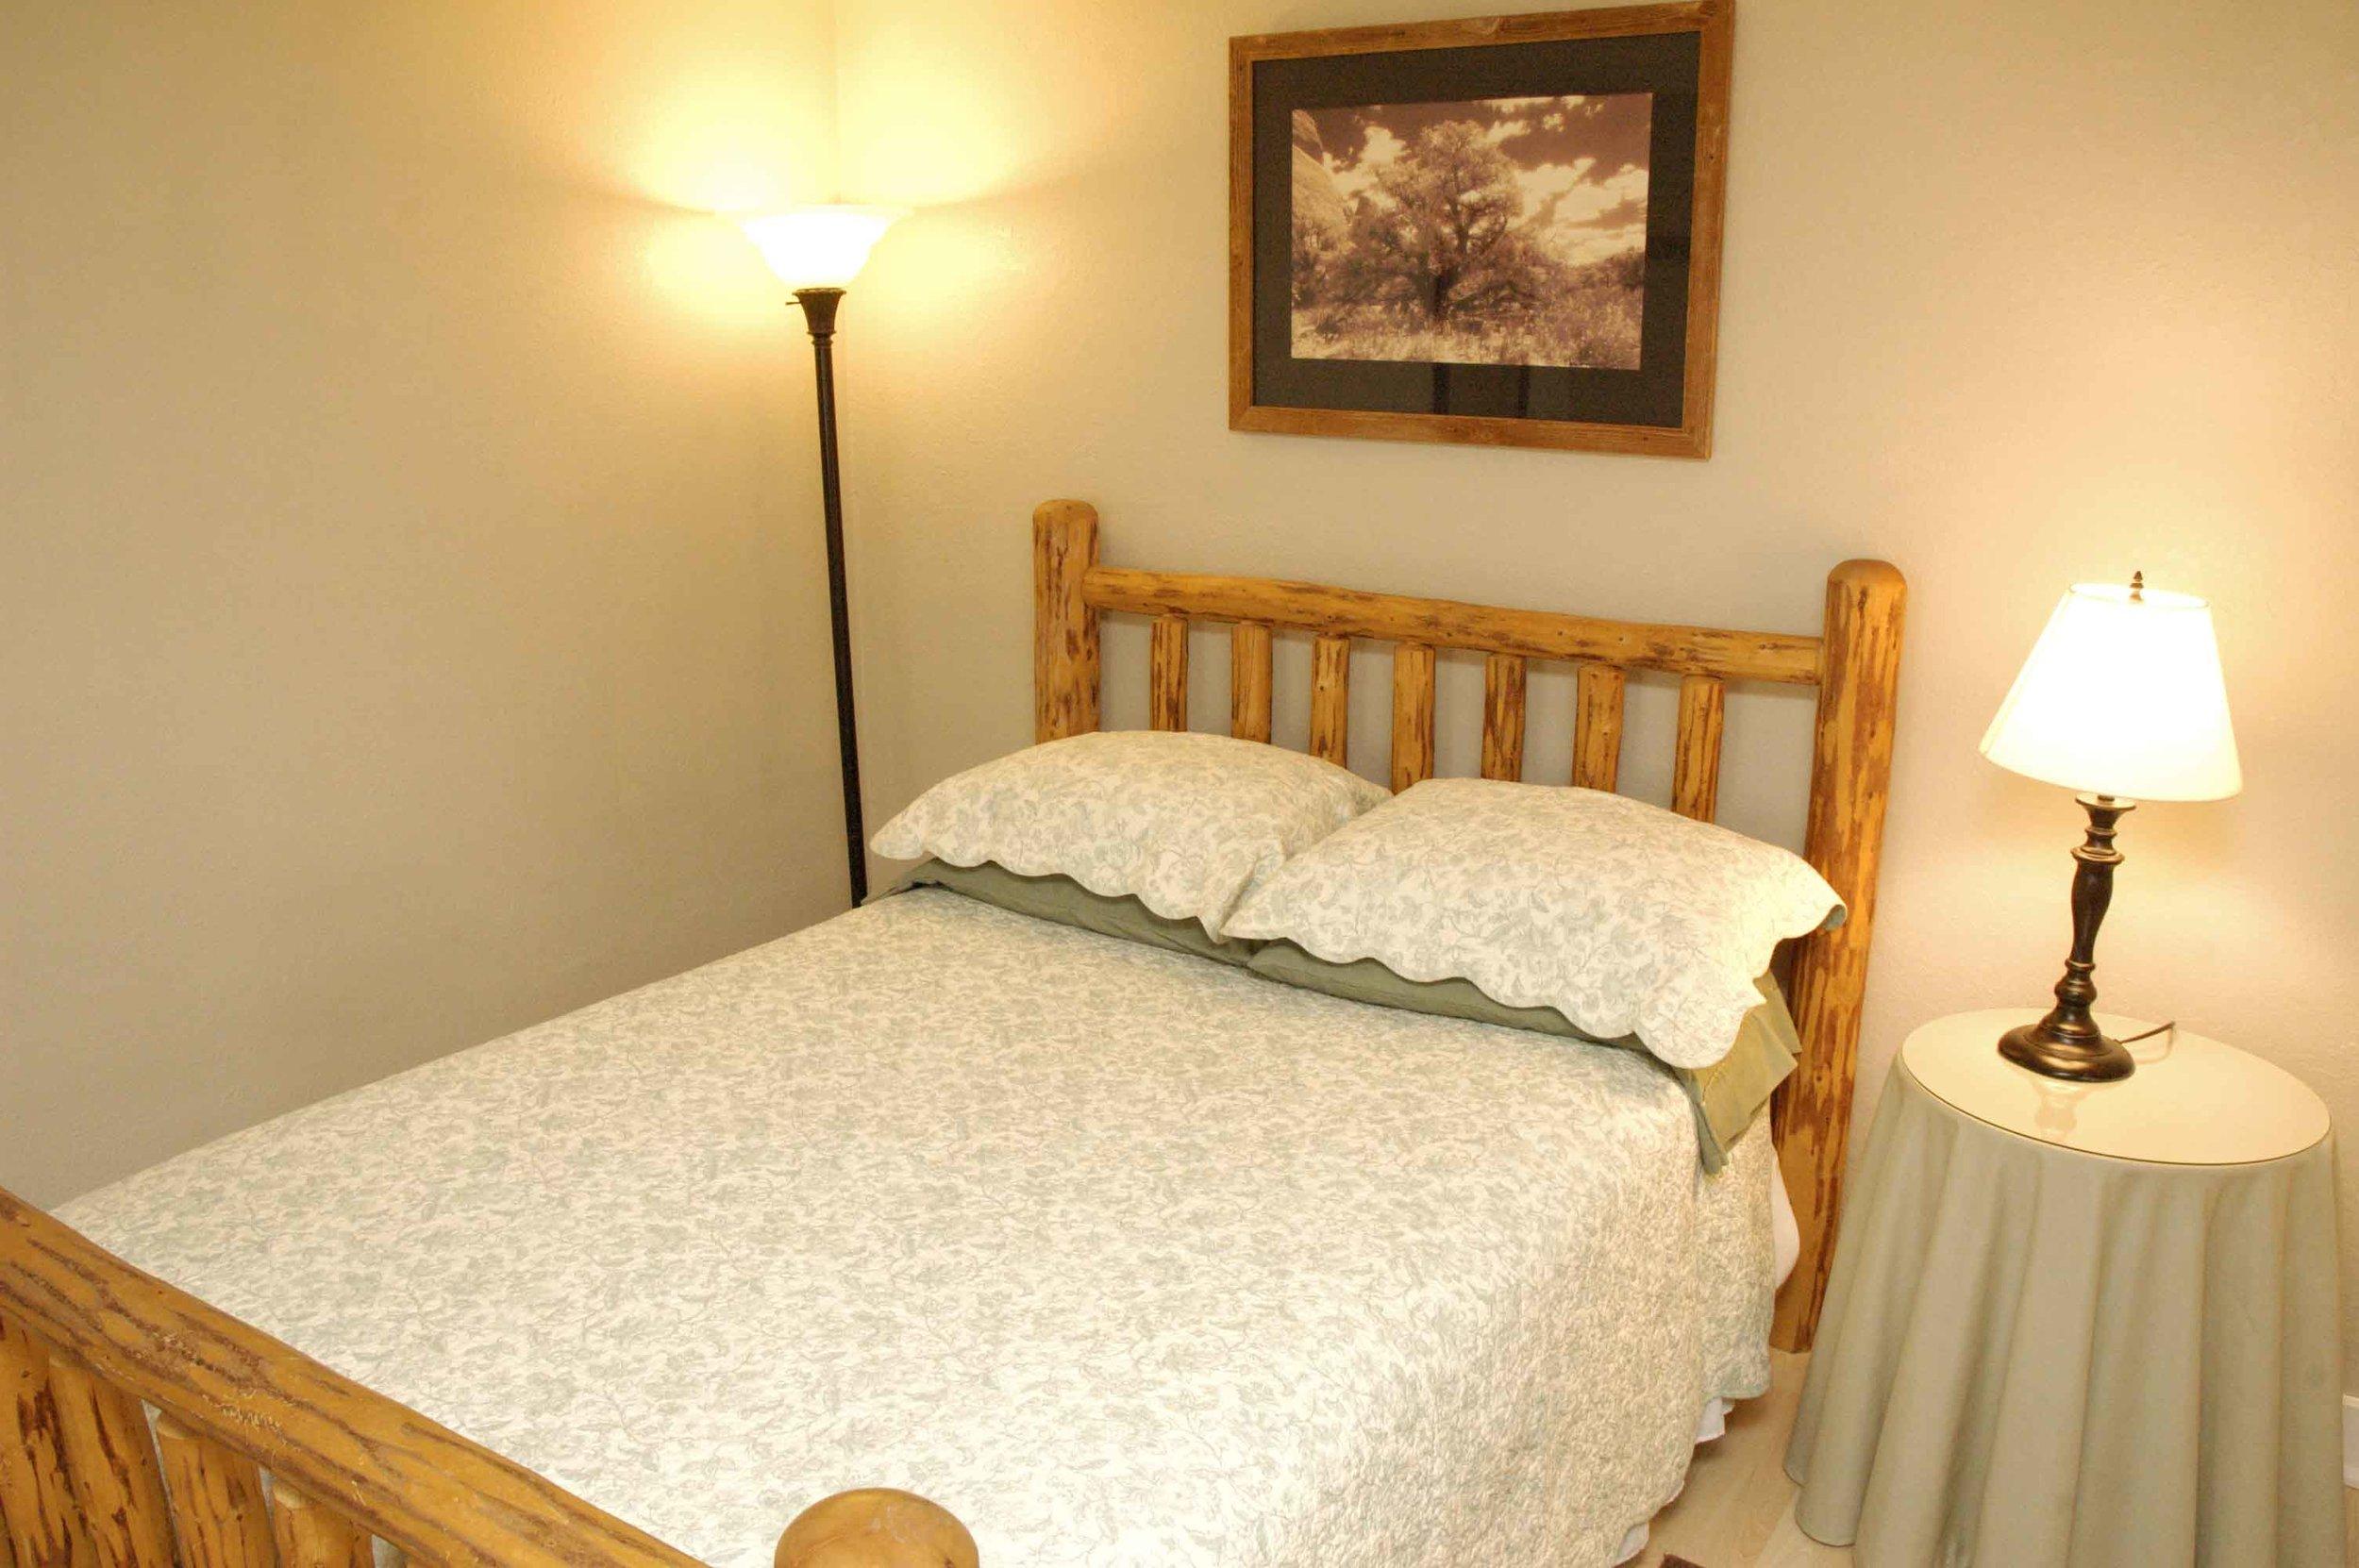 _DSC6712 kingfisher bedroom 1.jpg